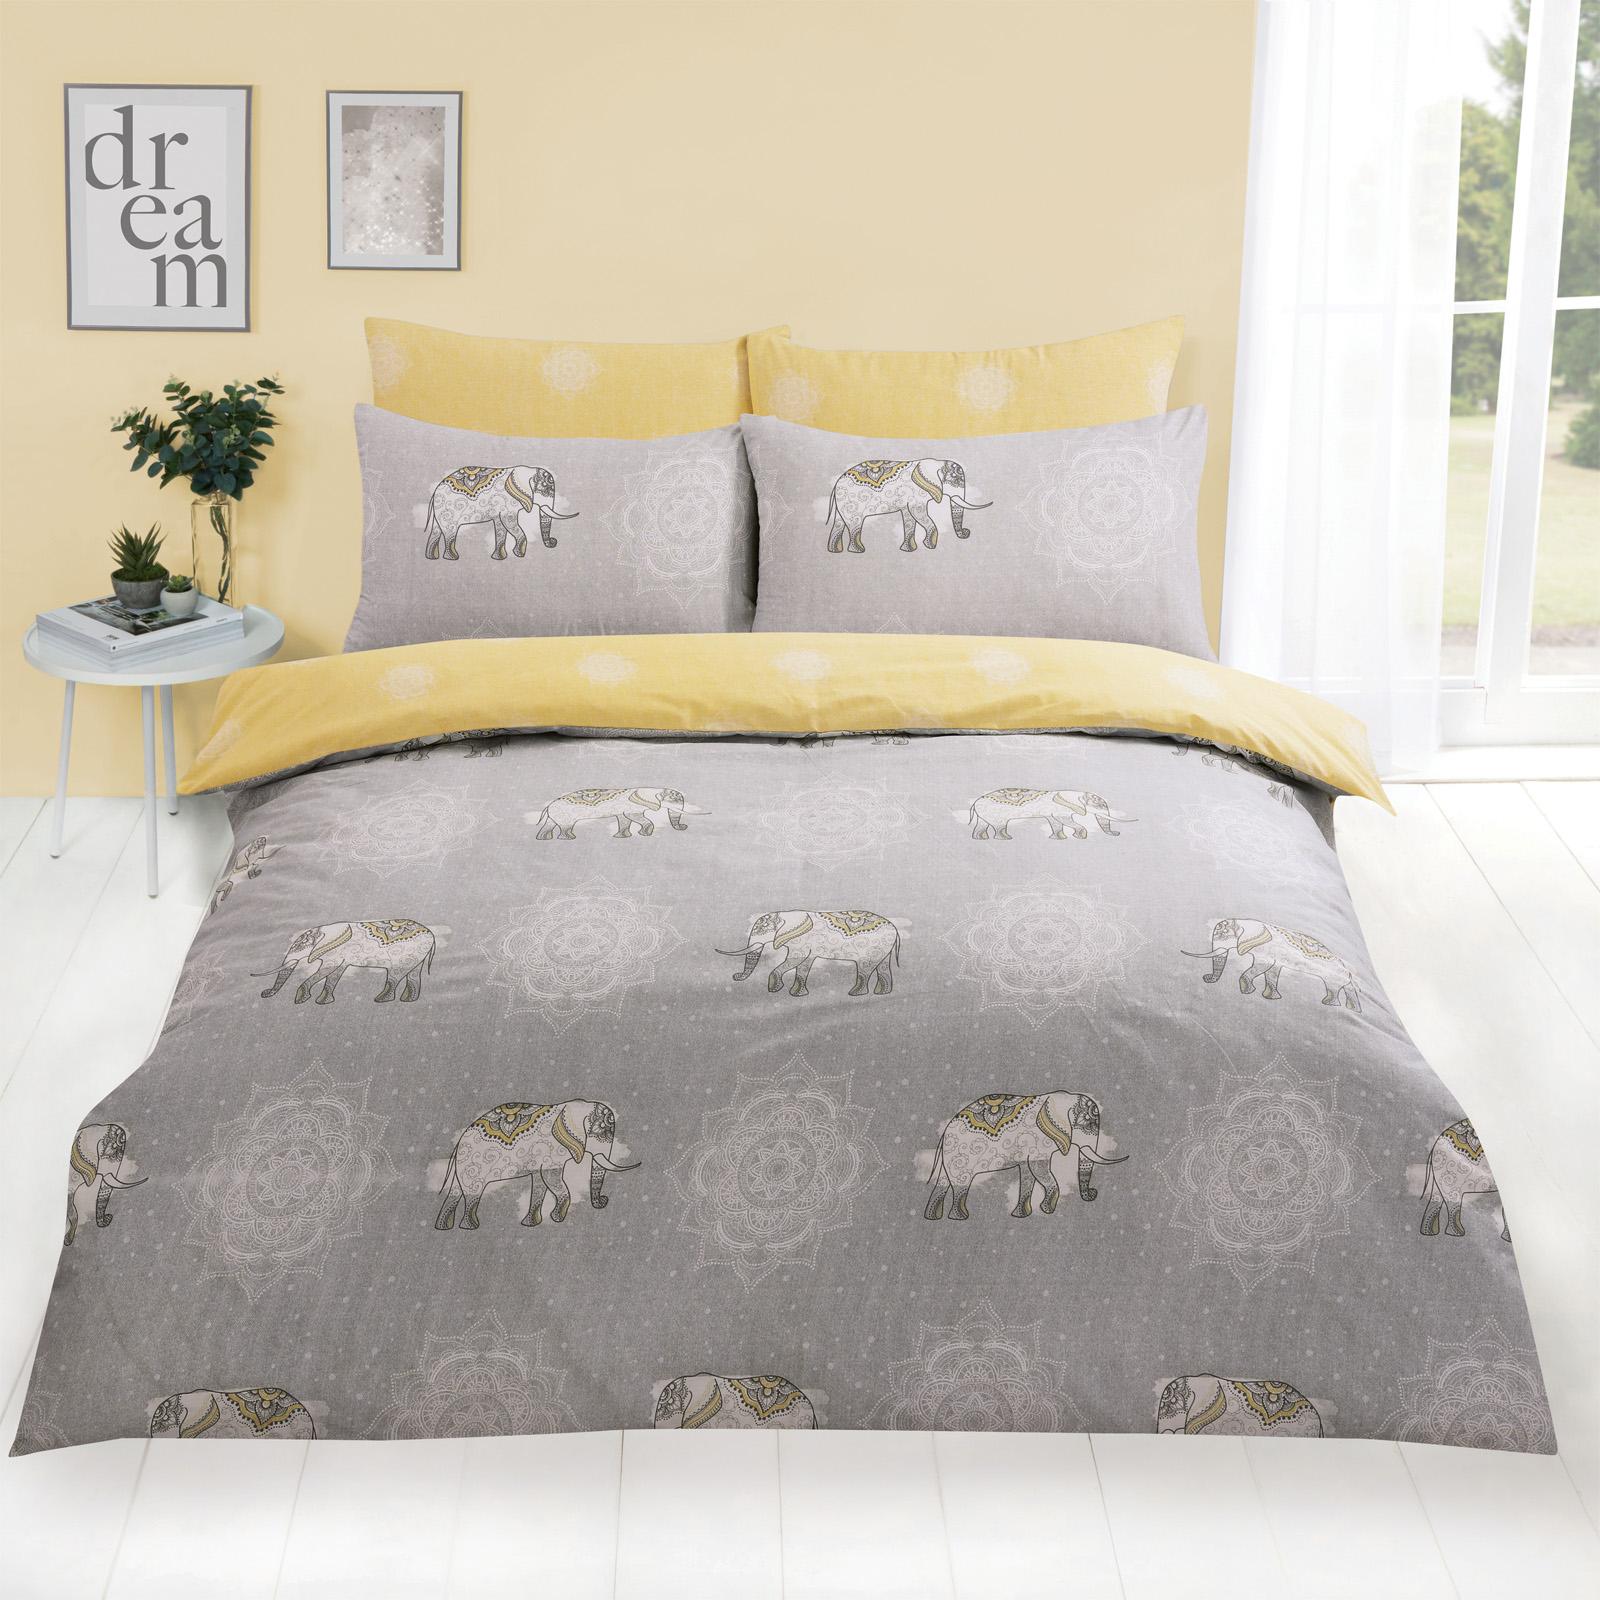 Details Zu Dreamscene Elefant Mandala Bett Bezug Mit Kissenbezug Bettwäsche Set Grau Ocker